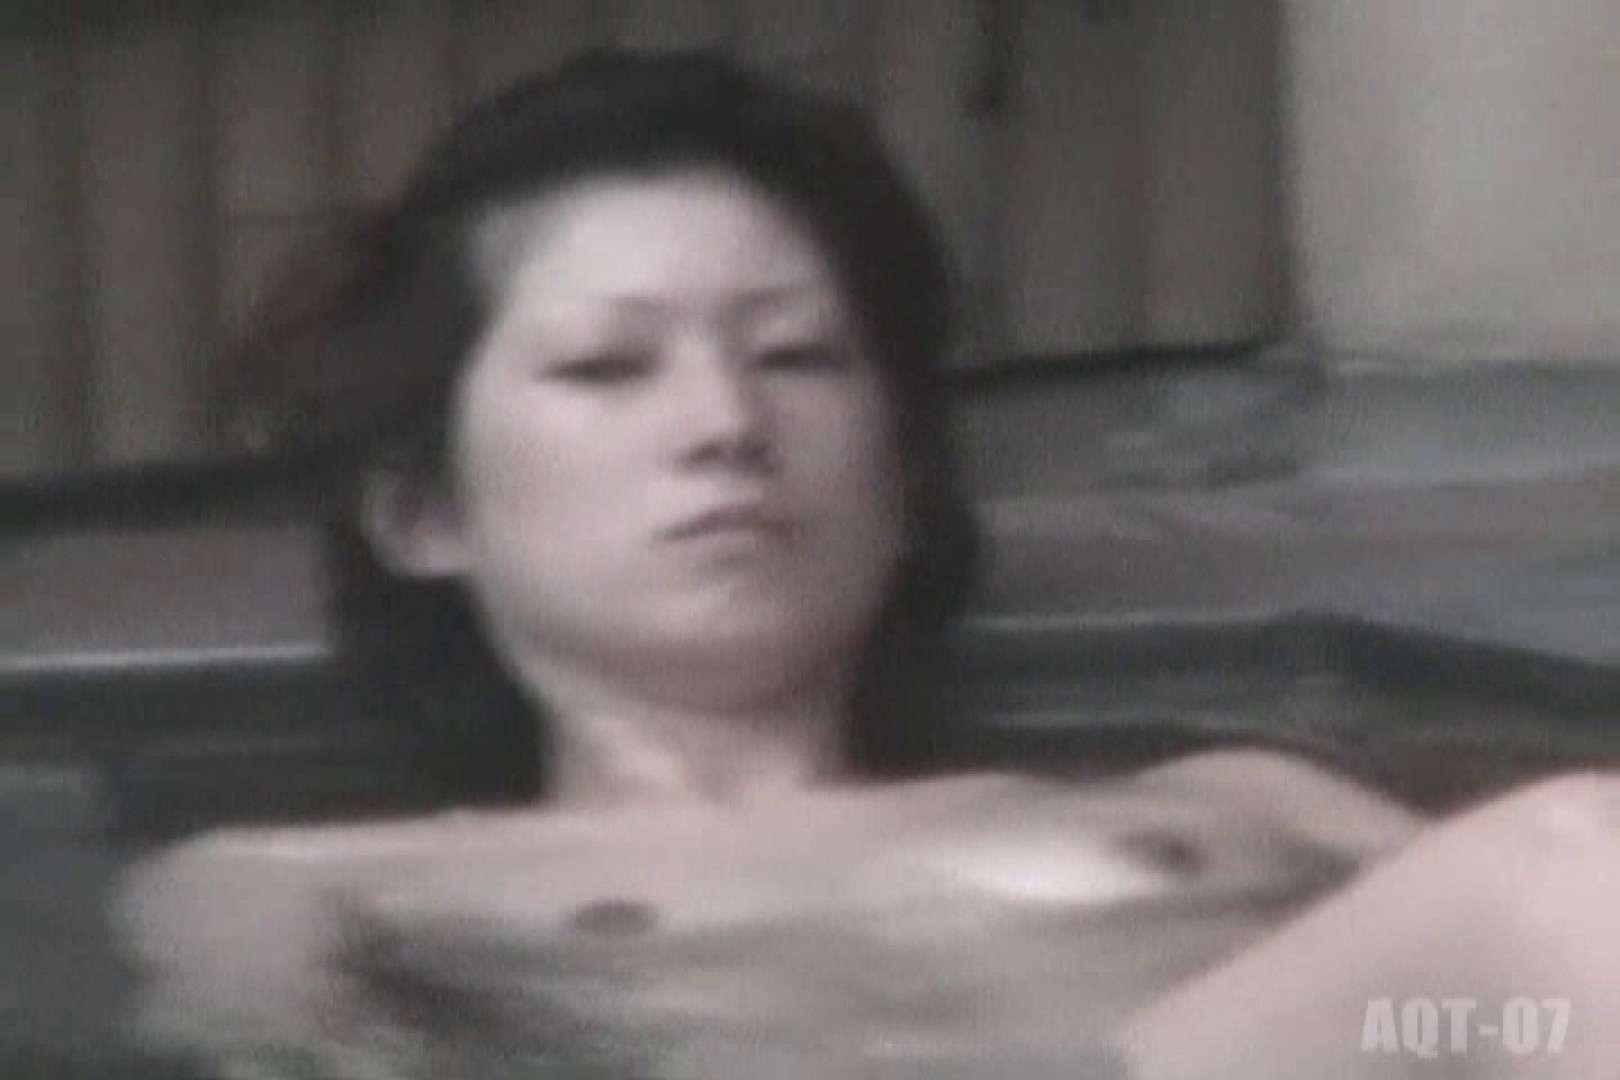 Aquaな露天風呂Vol.766 盗撮シリーズ | 露天風呂編  91PIX 21